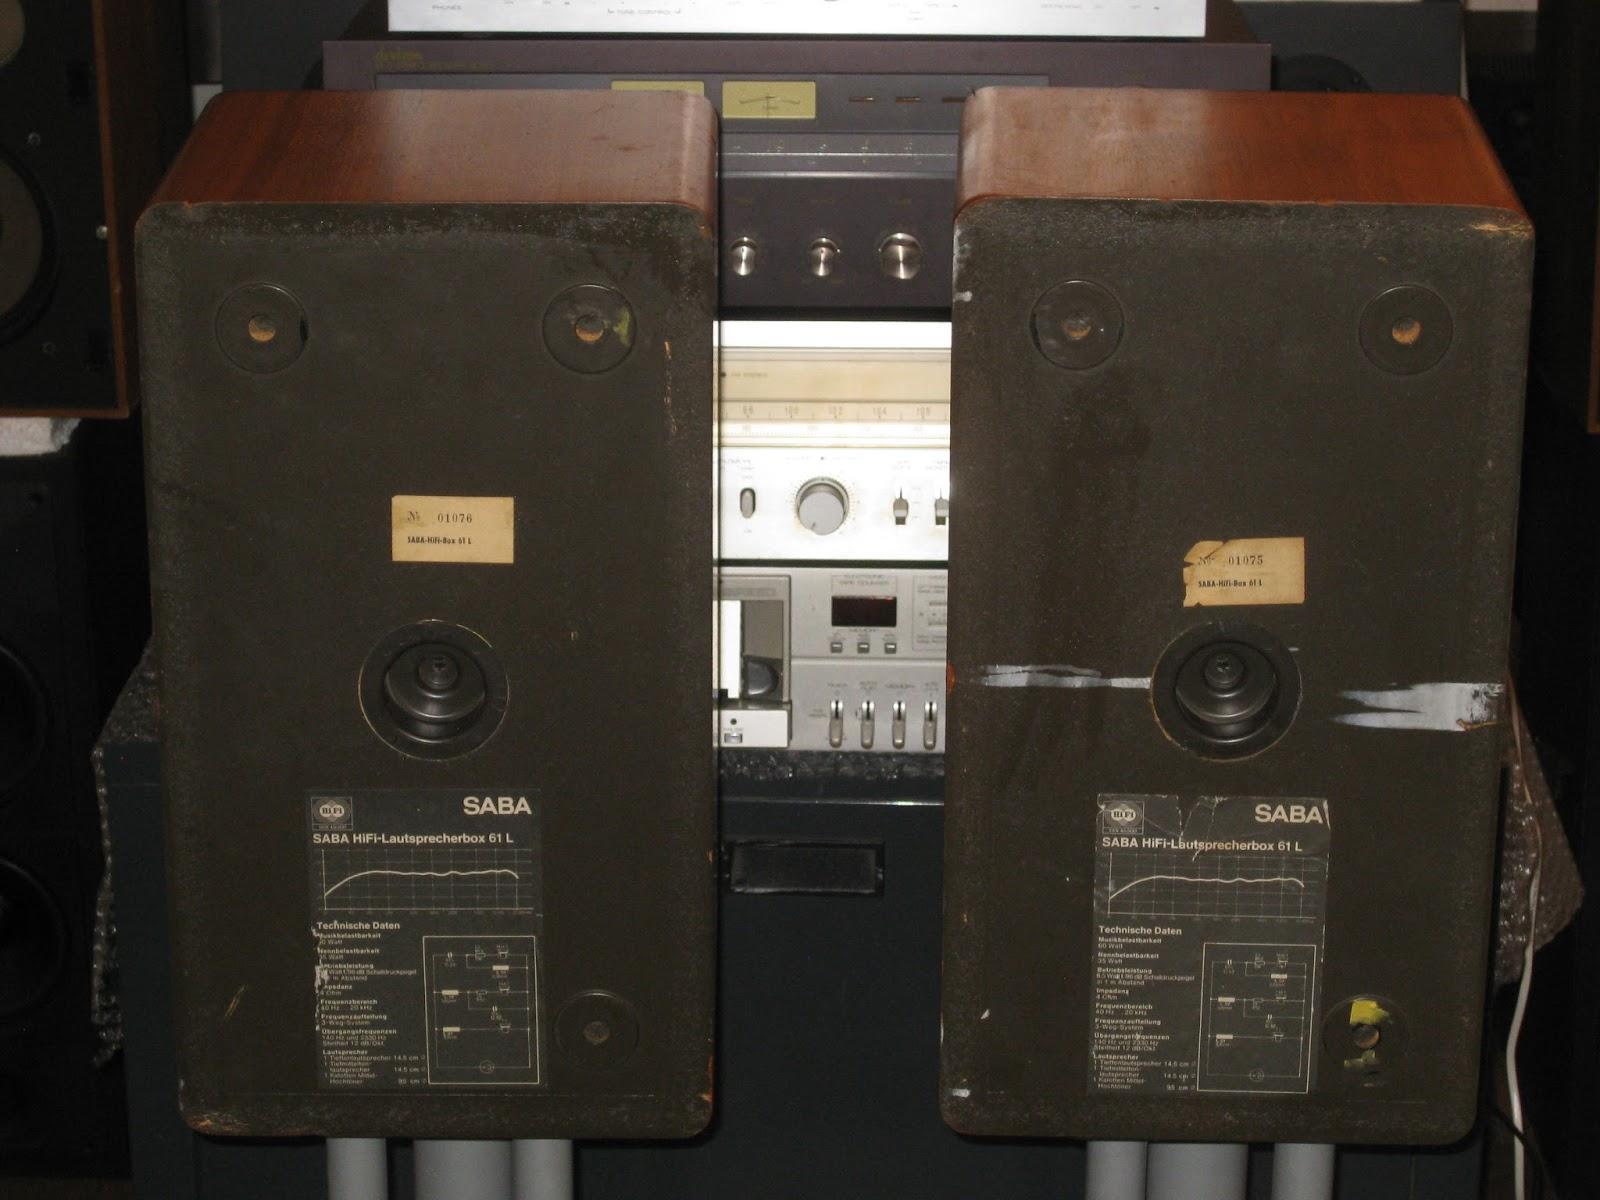 infrequent sound technology saba hifi lautsprecher box 61l 1978 made in germany. Black Bedroom Furniture Sets. Home Design Ideas